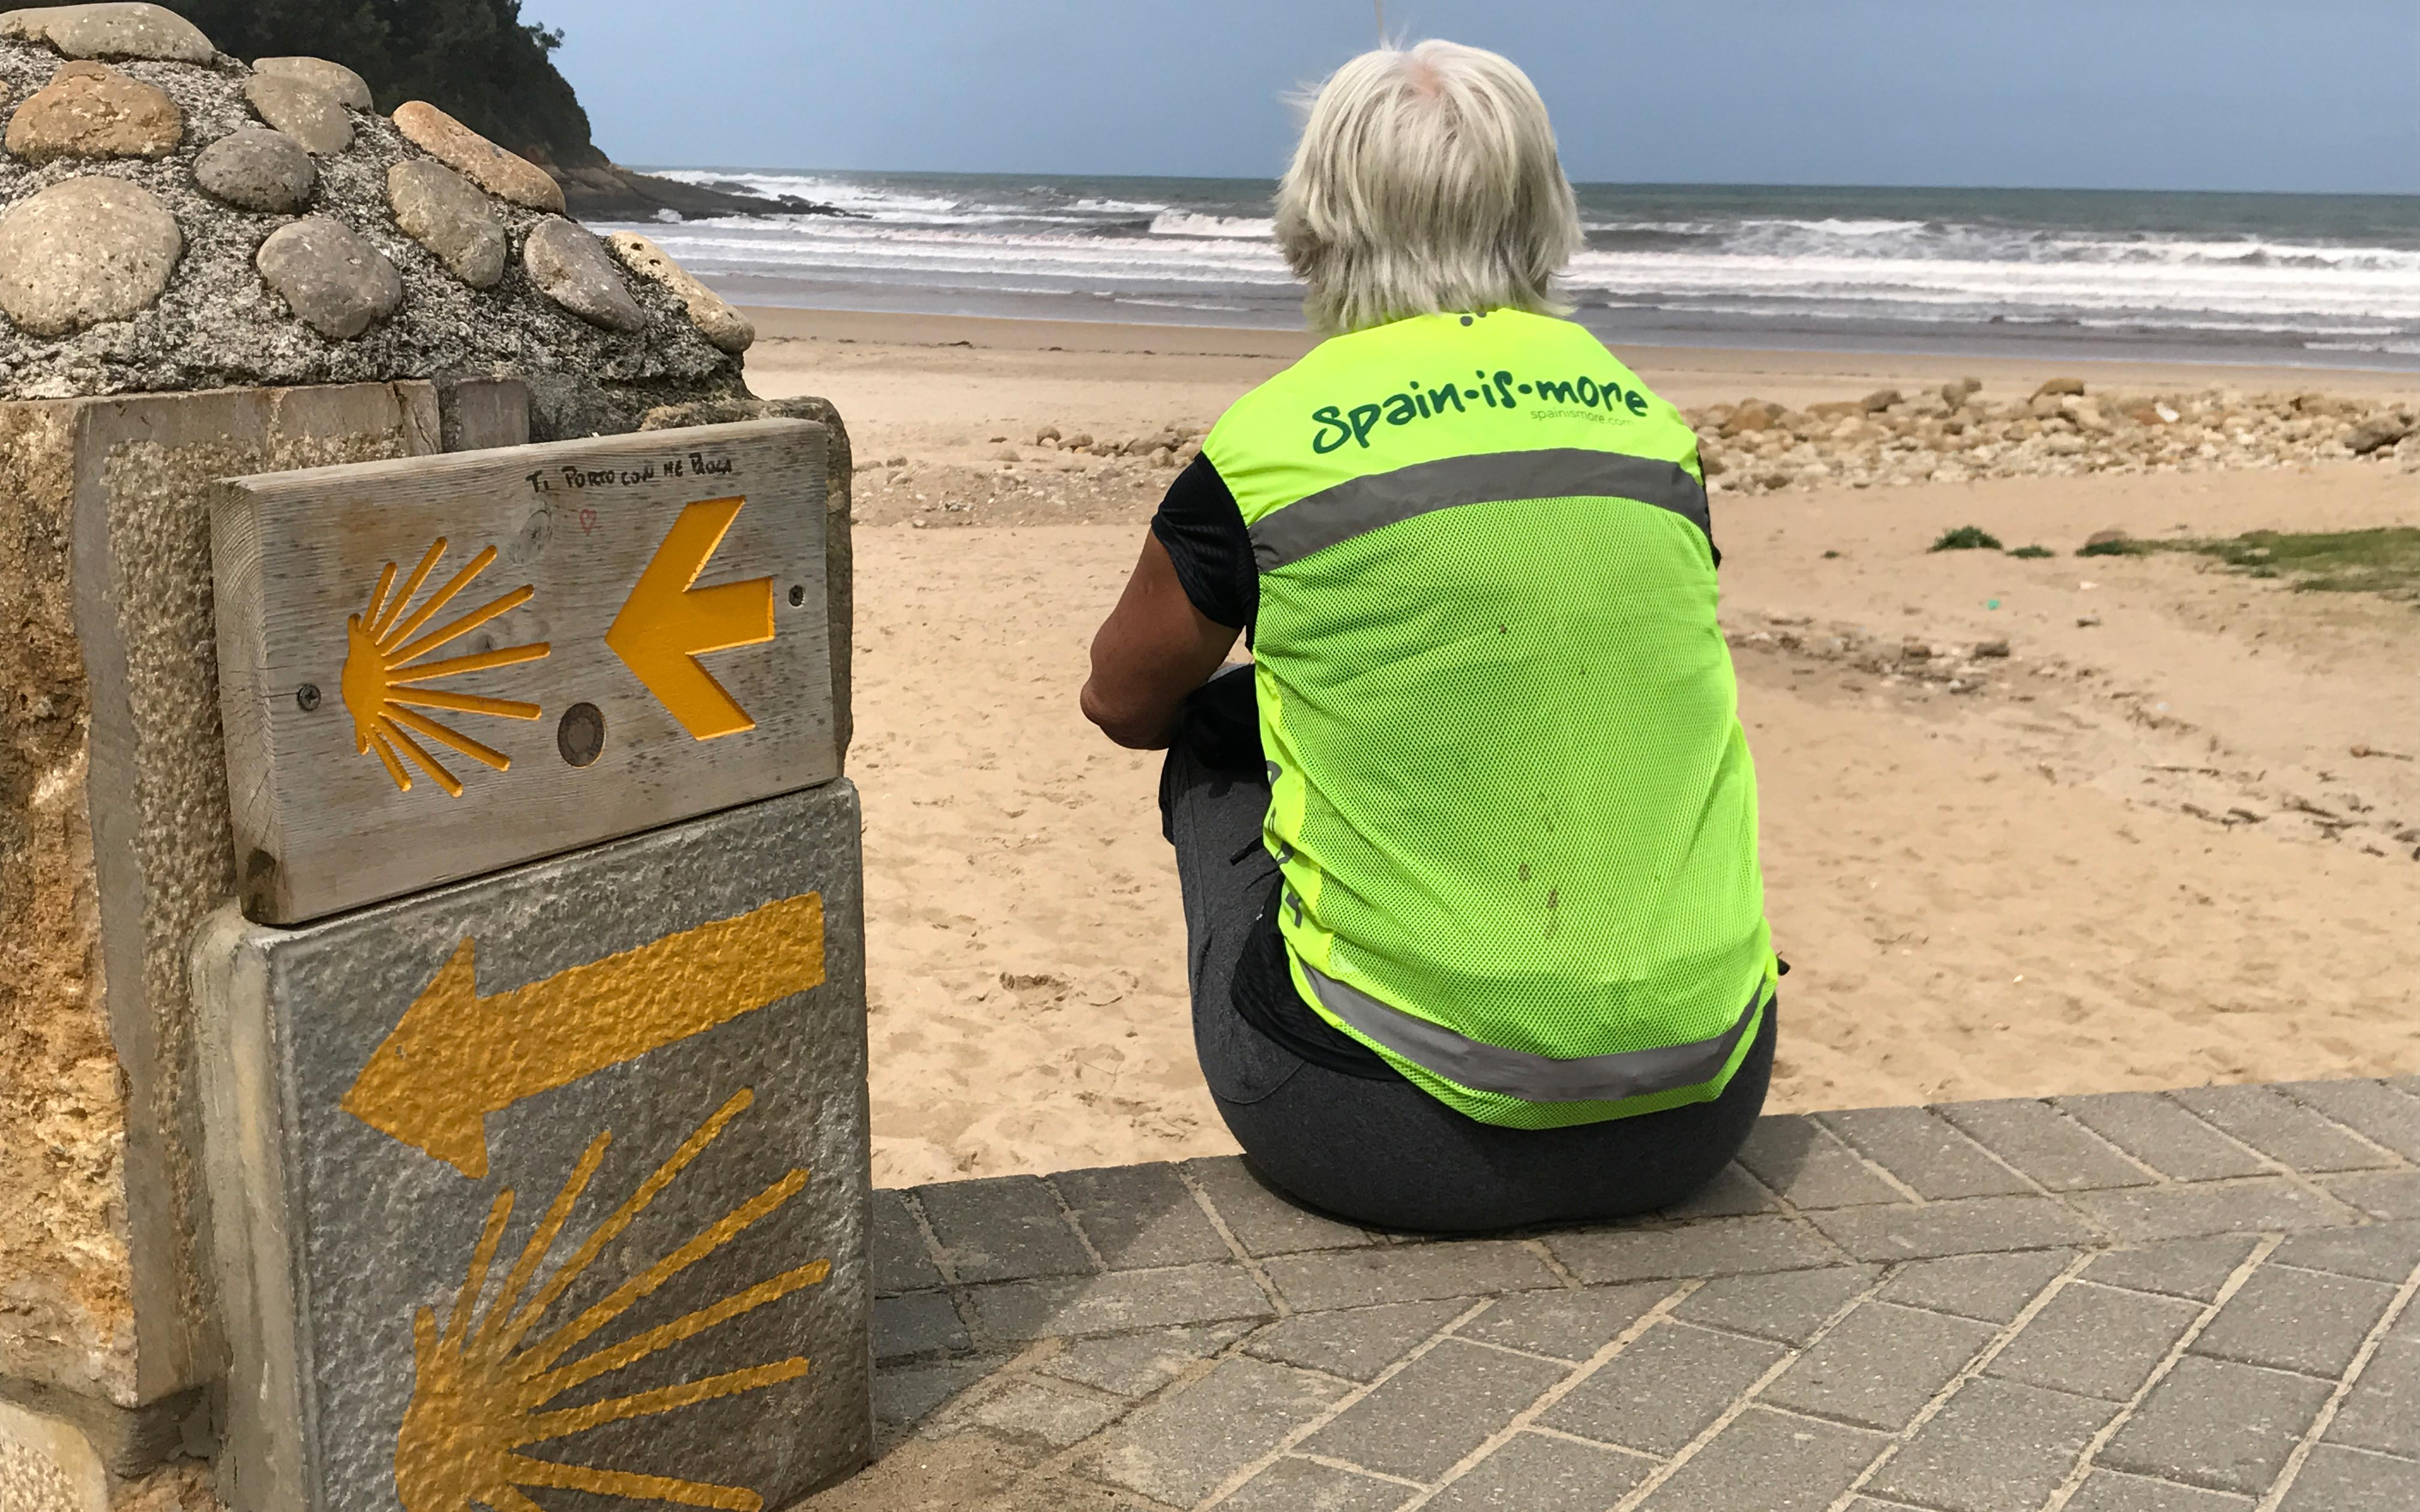 2d2c84288769 La Concha in San Sebastián - Europas bester Strand - News - Blog en ...